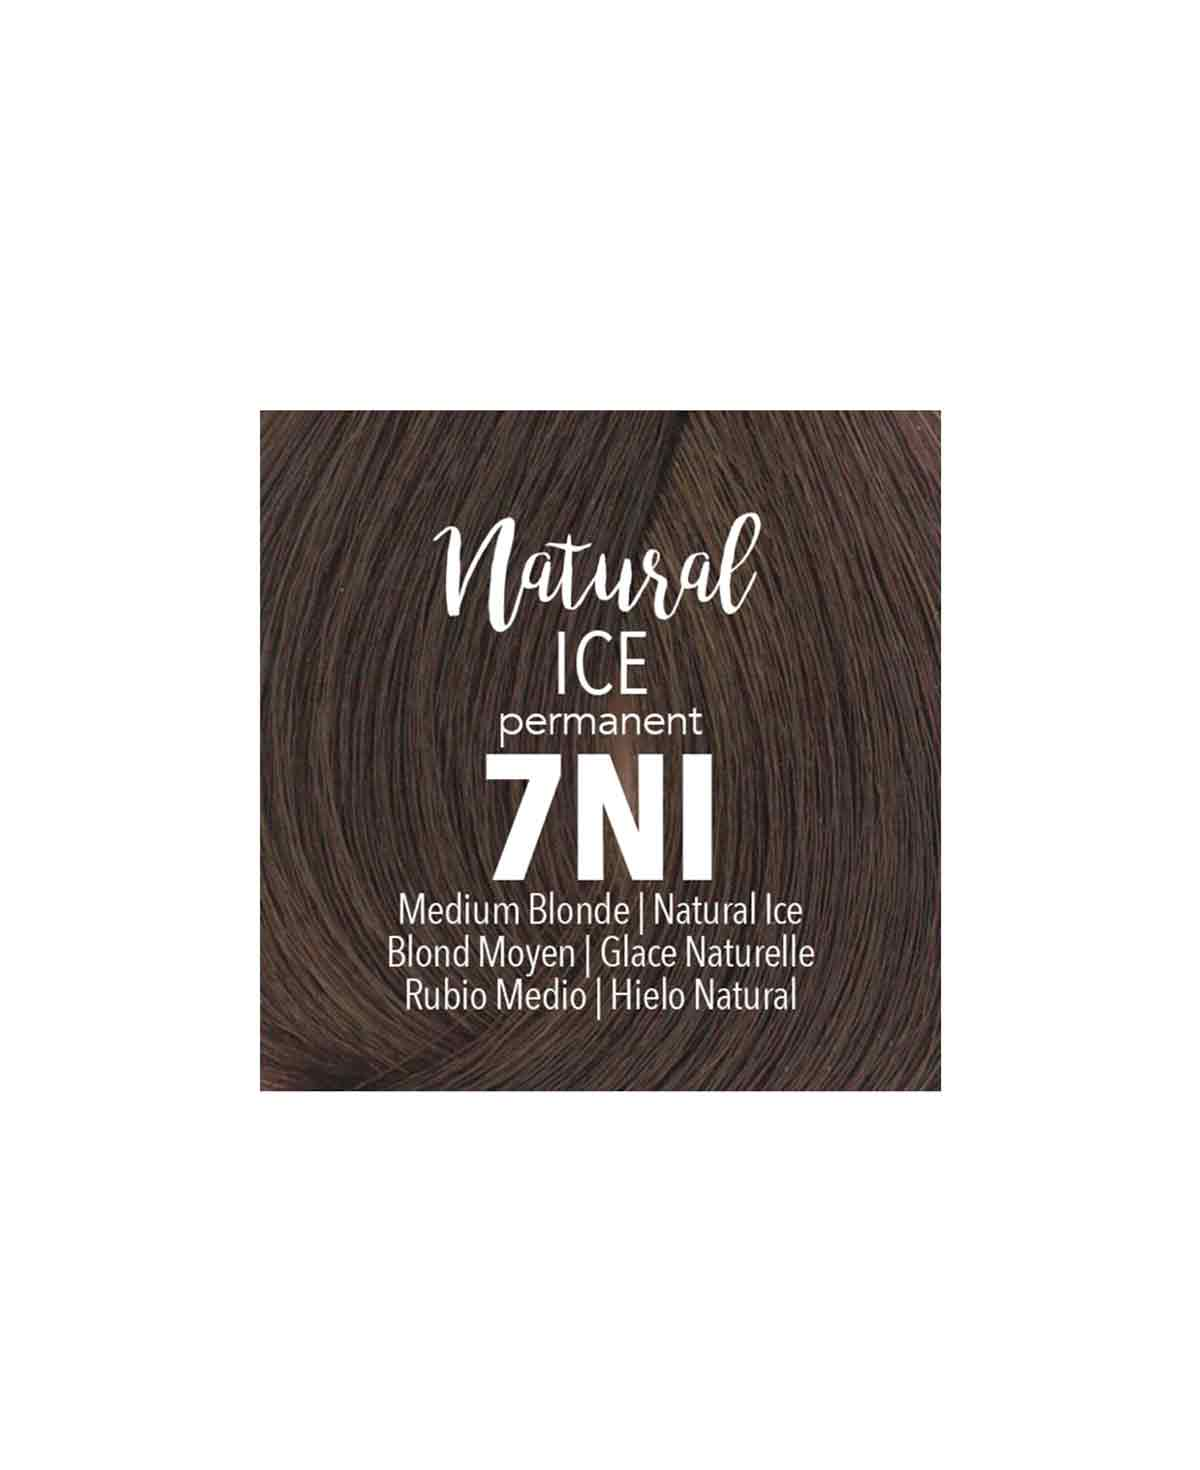 Mydentity - 9NI Light Blonde Natural Ice